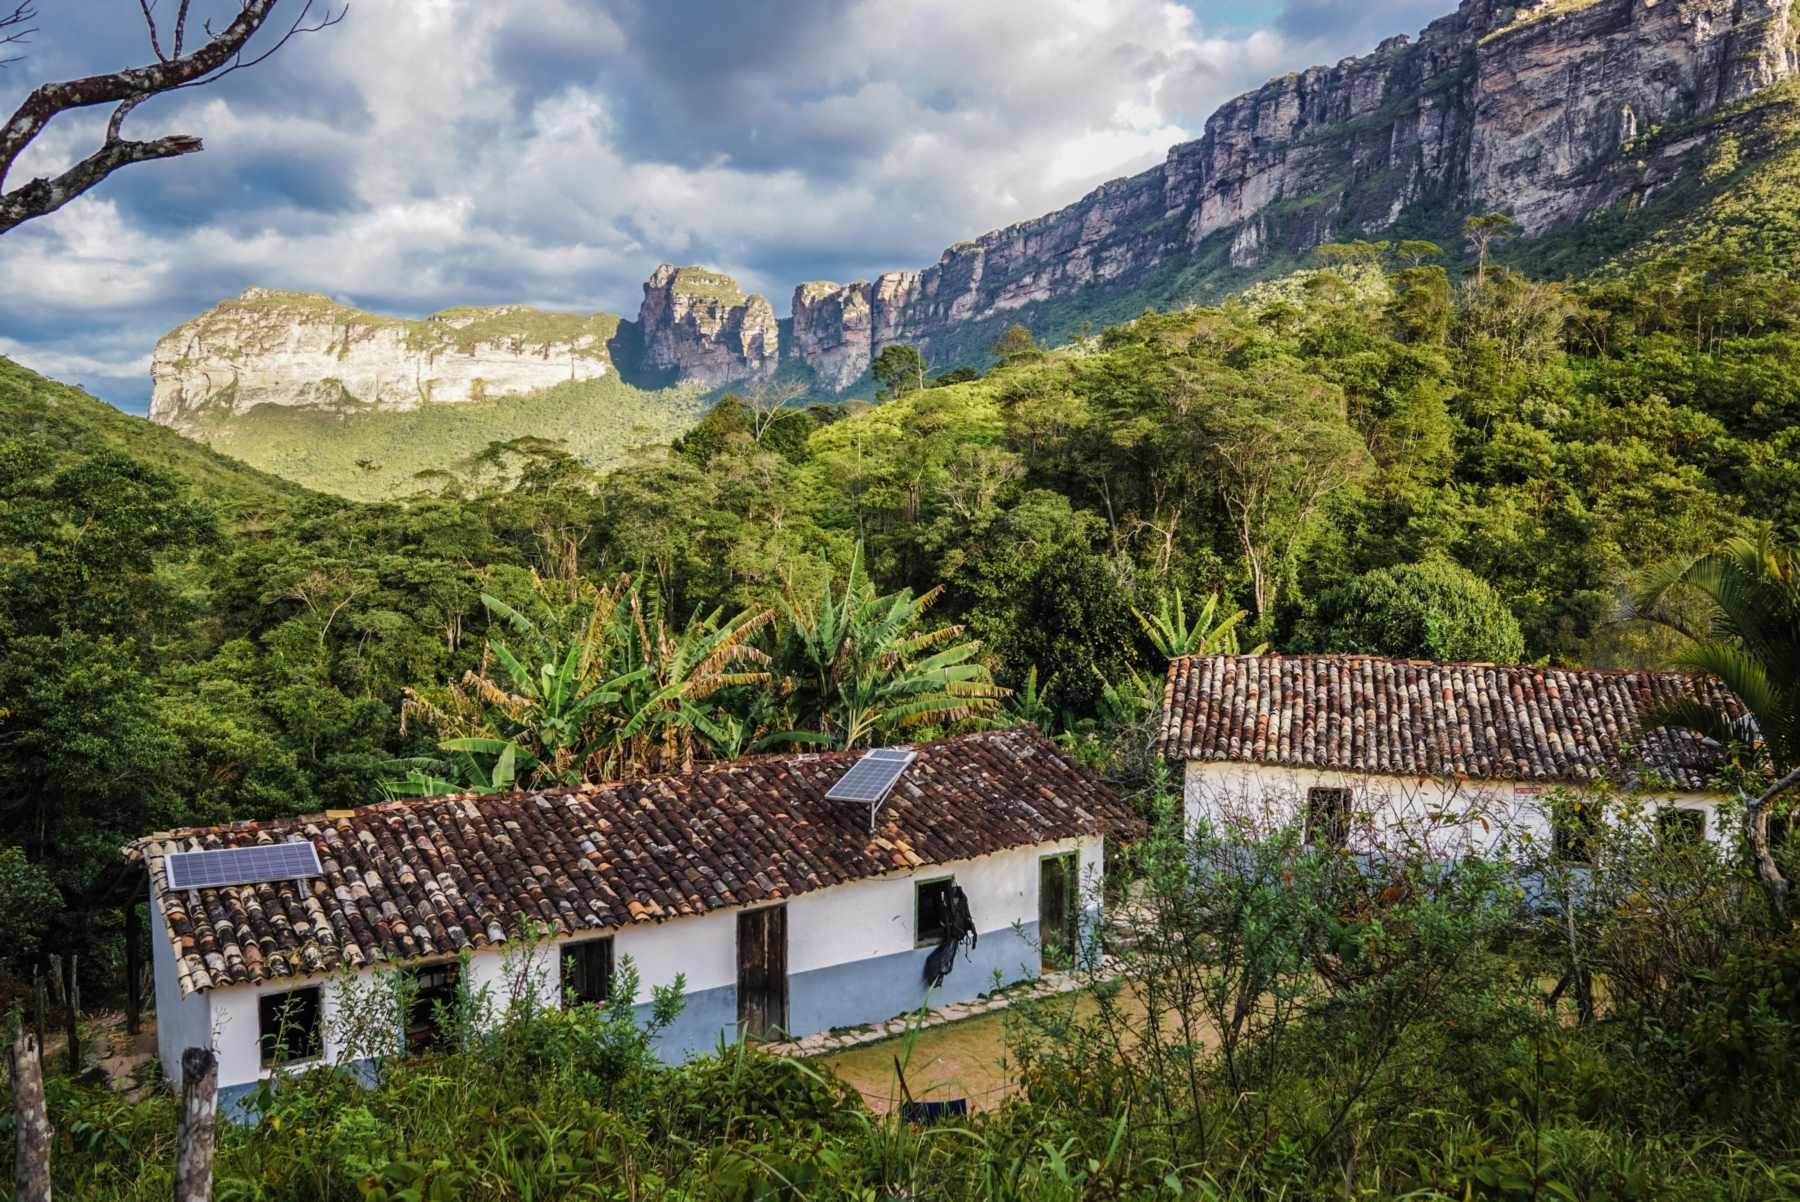 Casa de Seu Wilson, Vale do Pati, Chapada Diamantina, Bahia, Bahia, Brazil